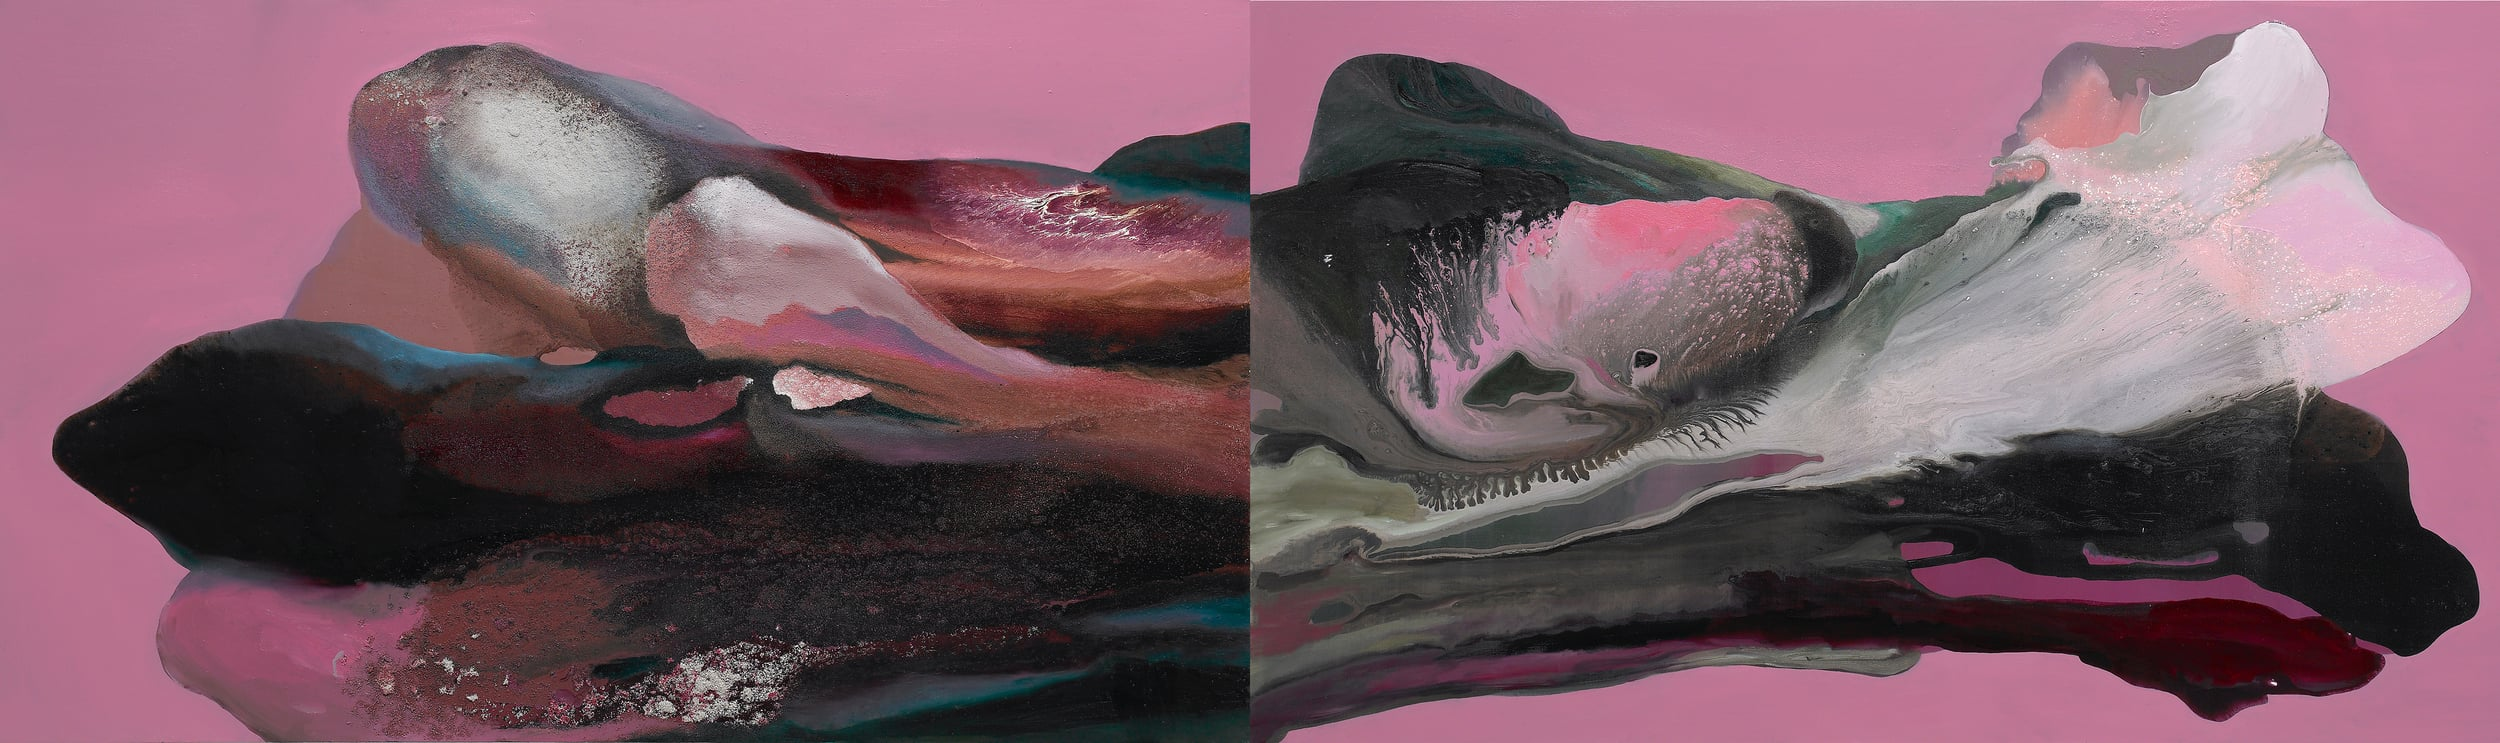 figure_17  acrylic and pumice  gel on canvas  324 cm X 97 cm  2015